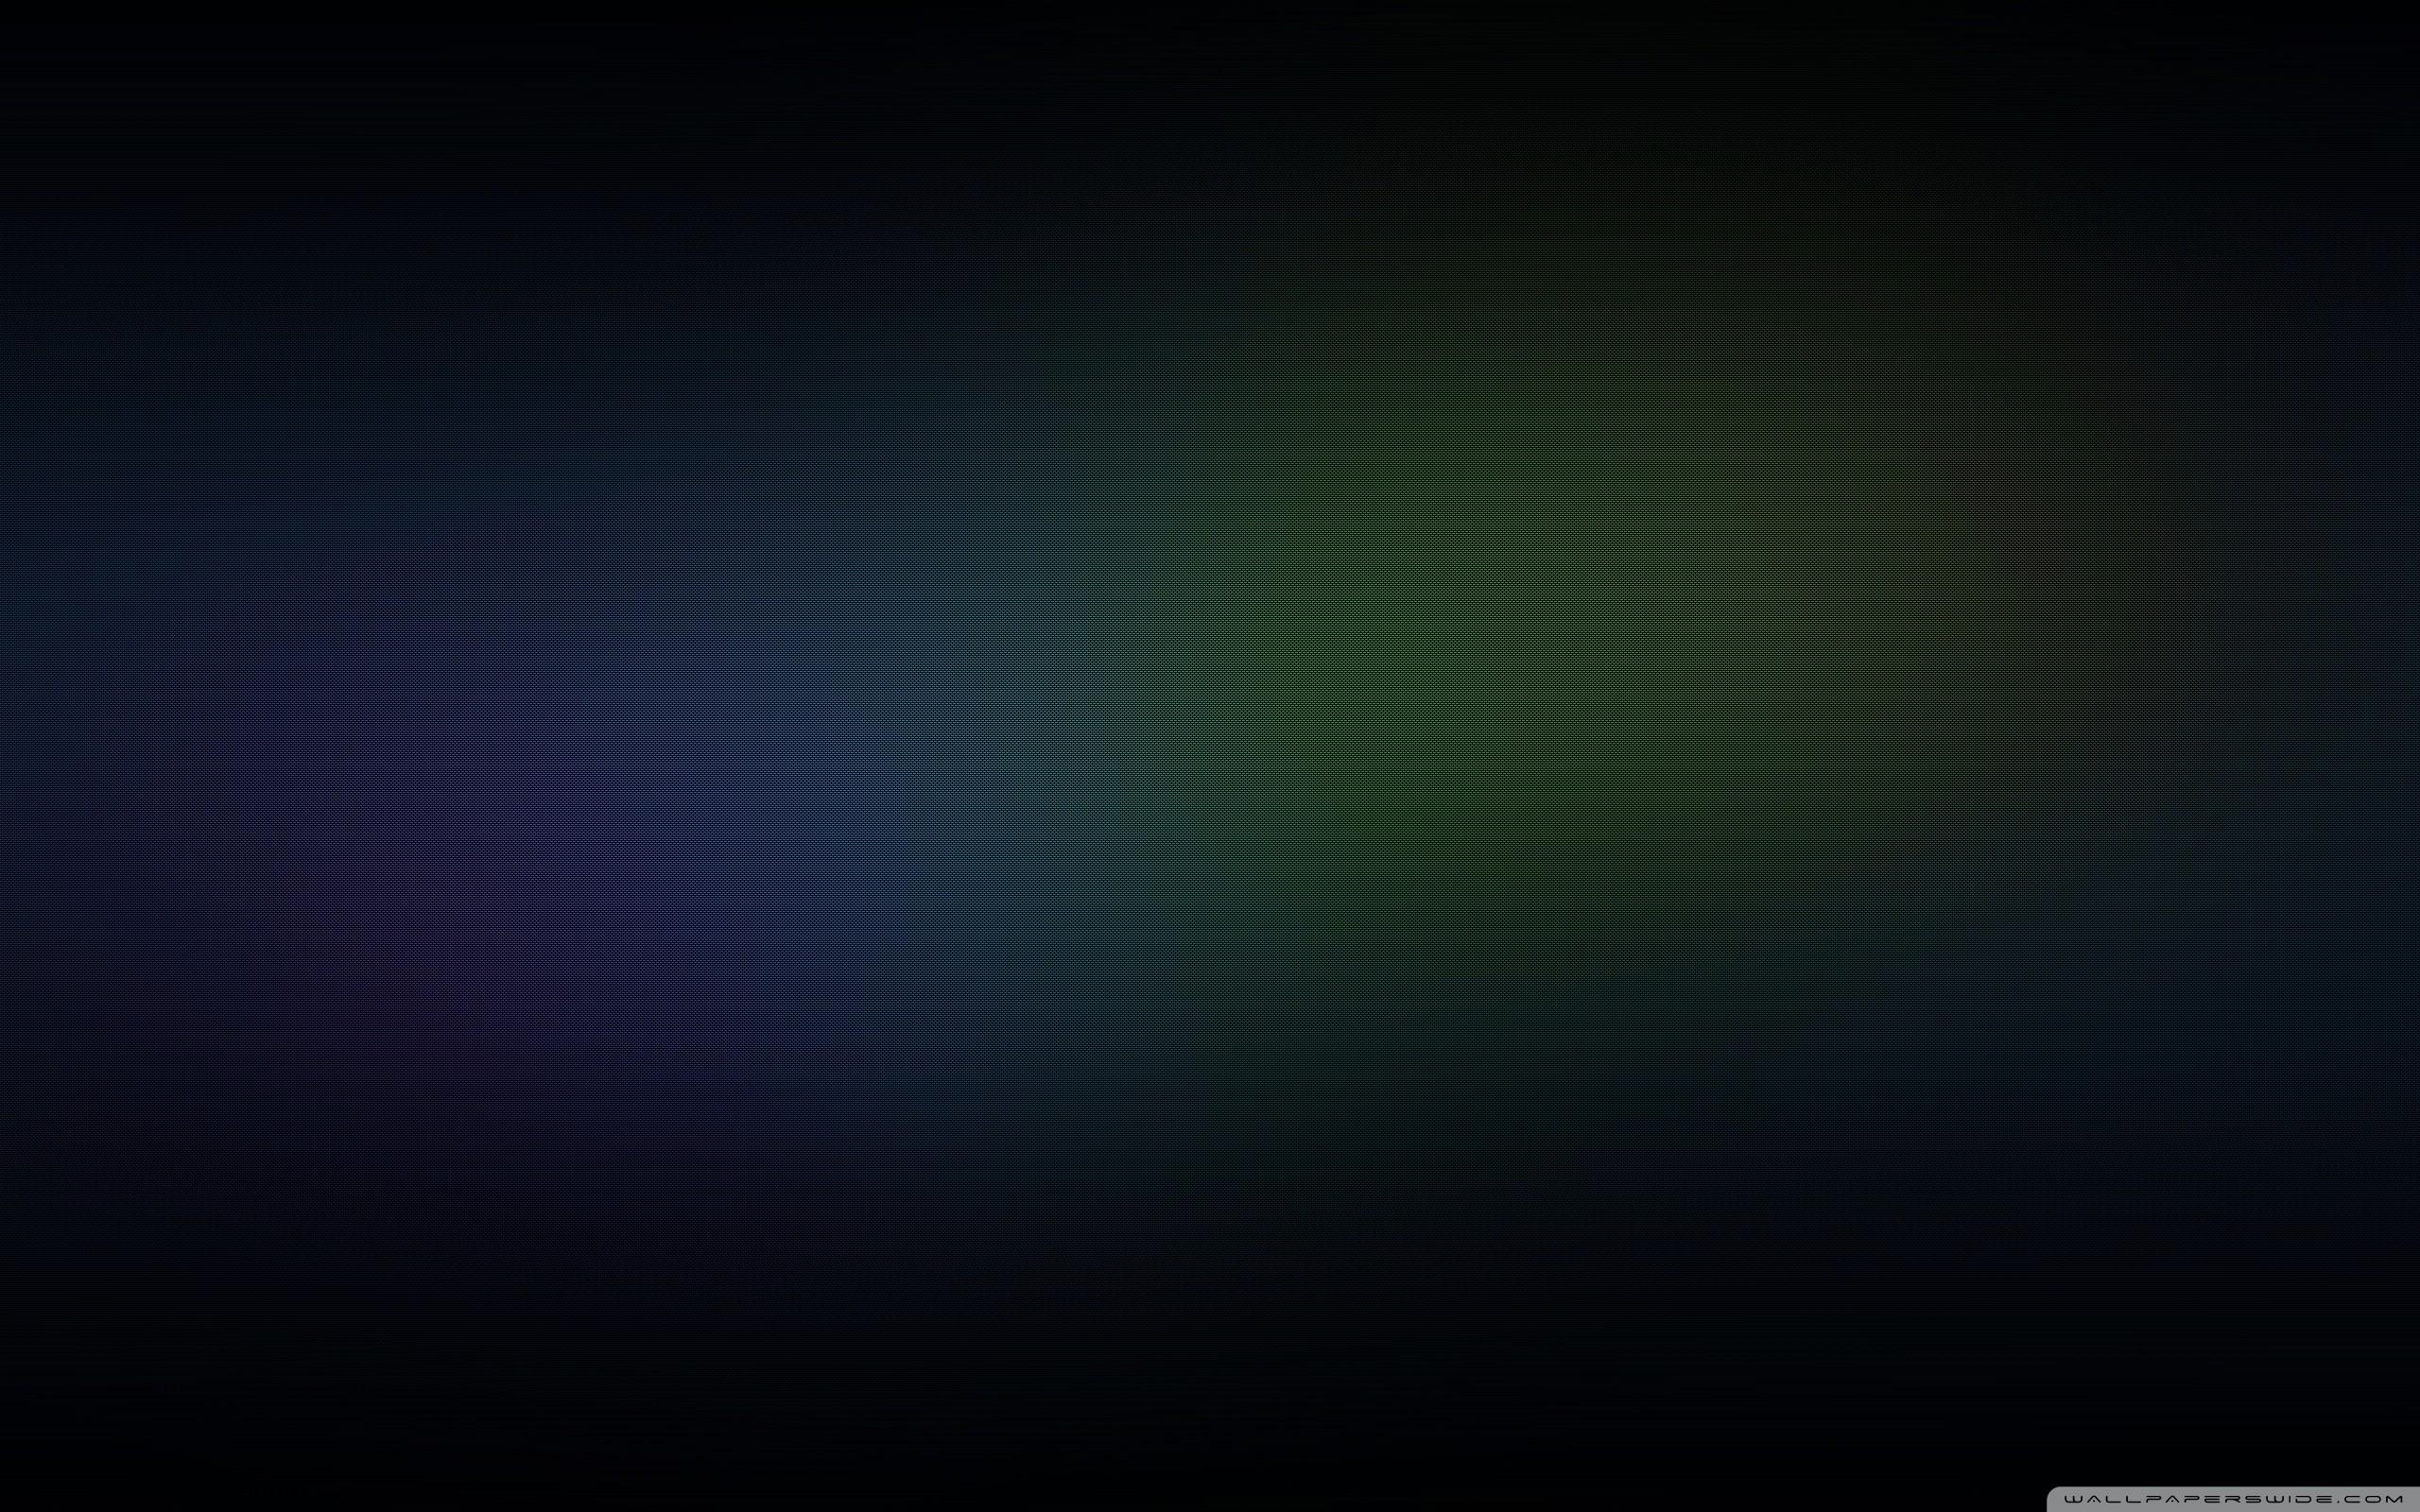 Dark Color Wallpaper 72 Images